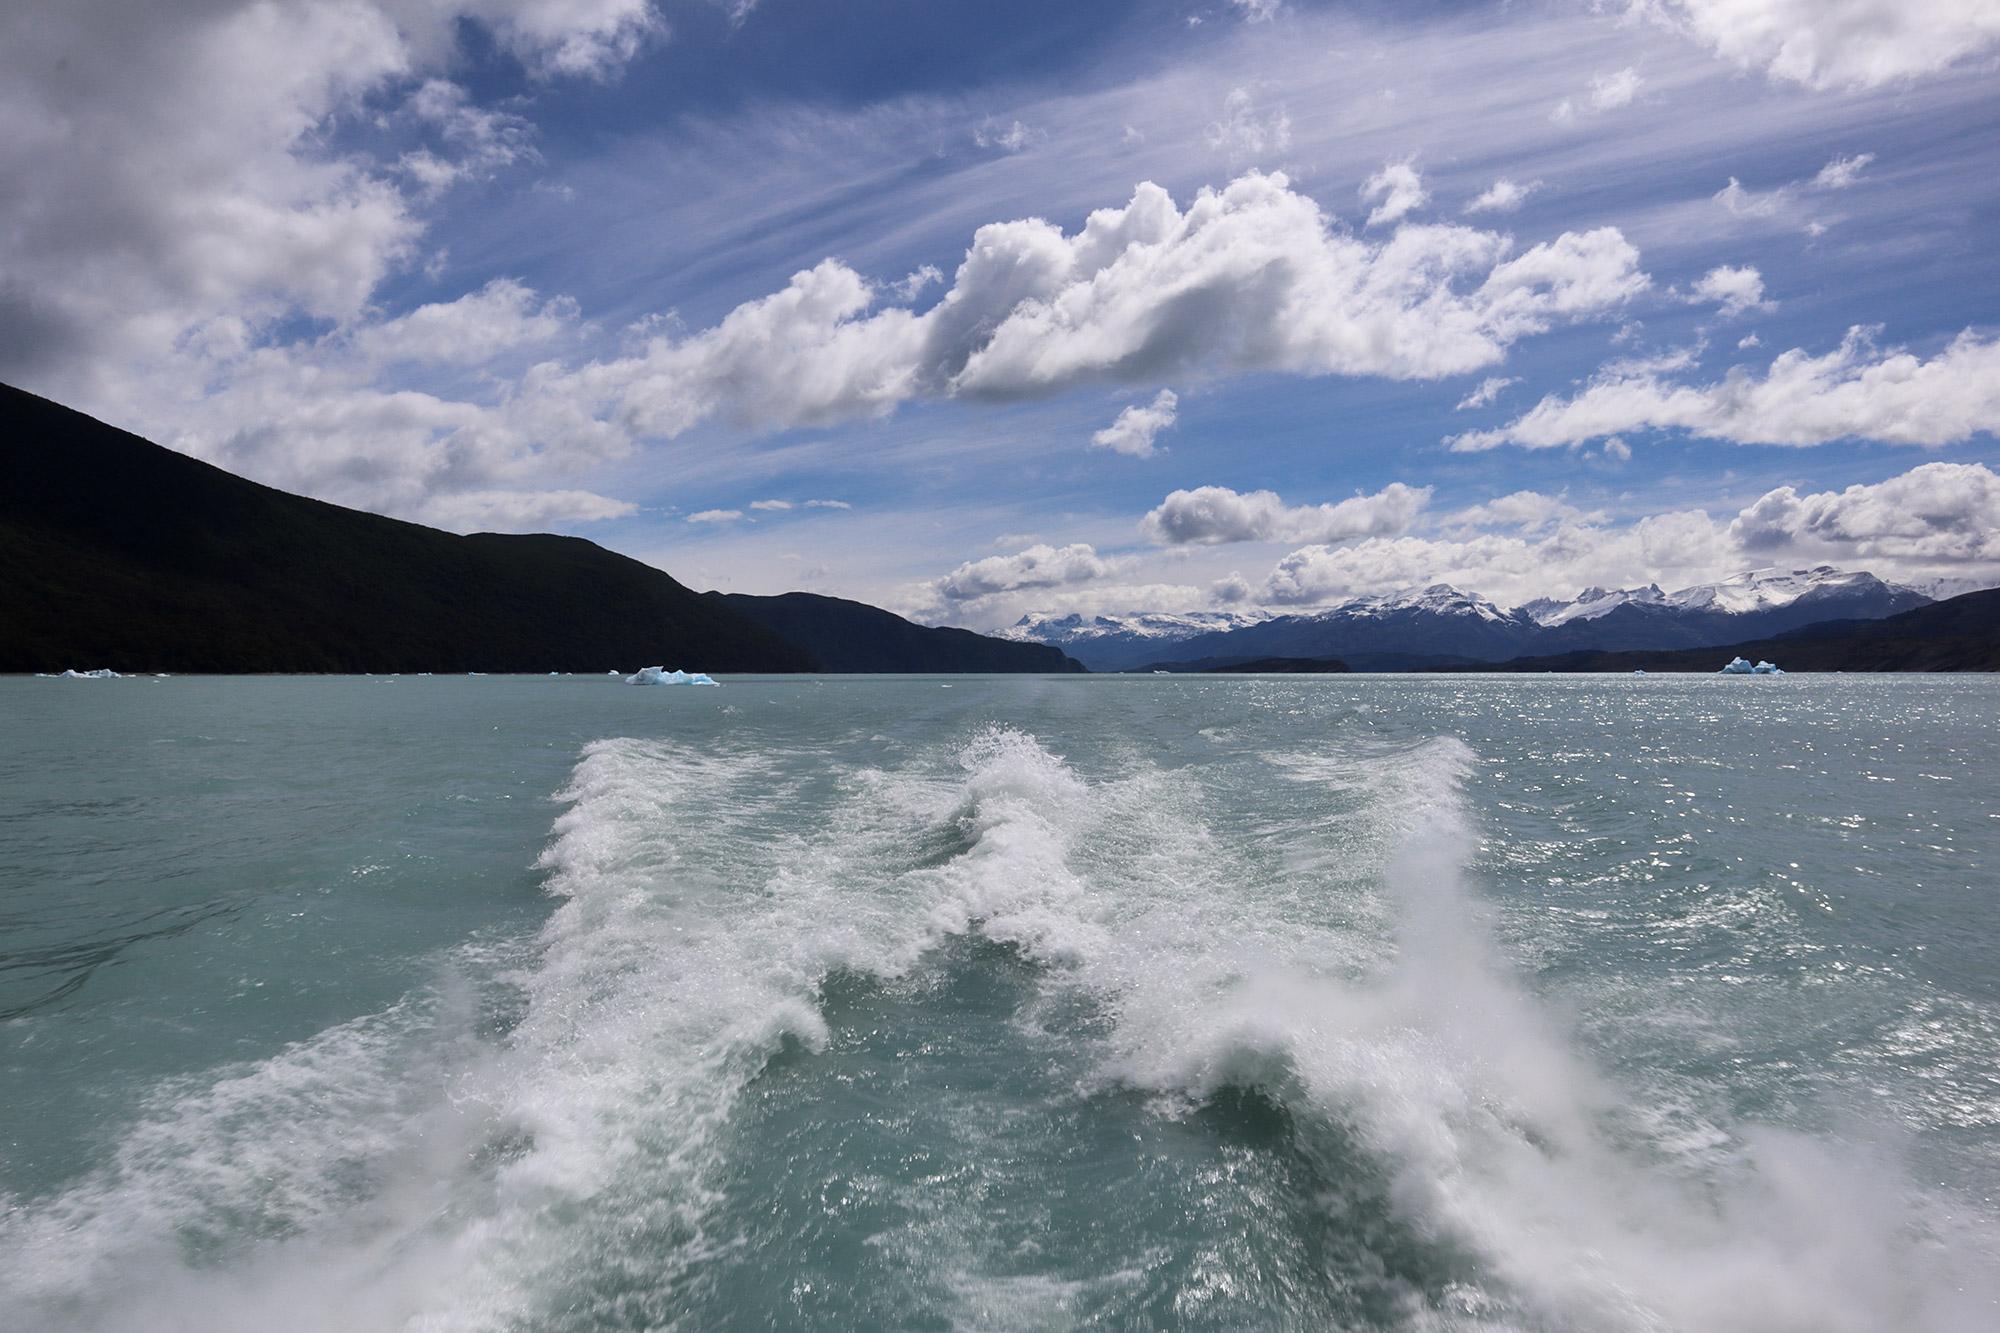 Reisverslag Patagonië - Parque Nacional Los Glaciares